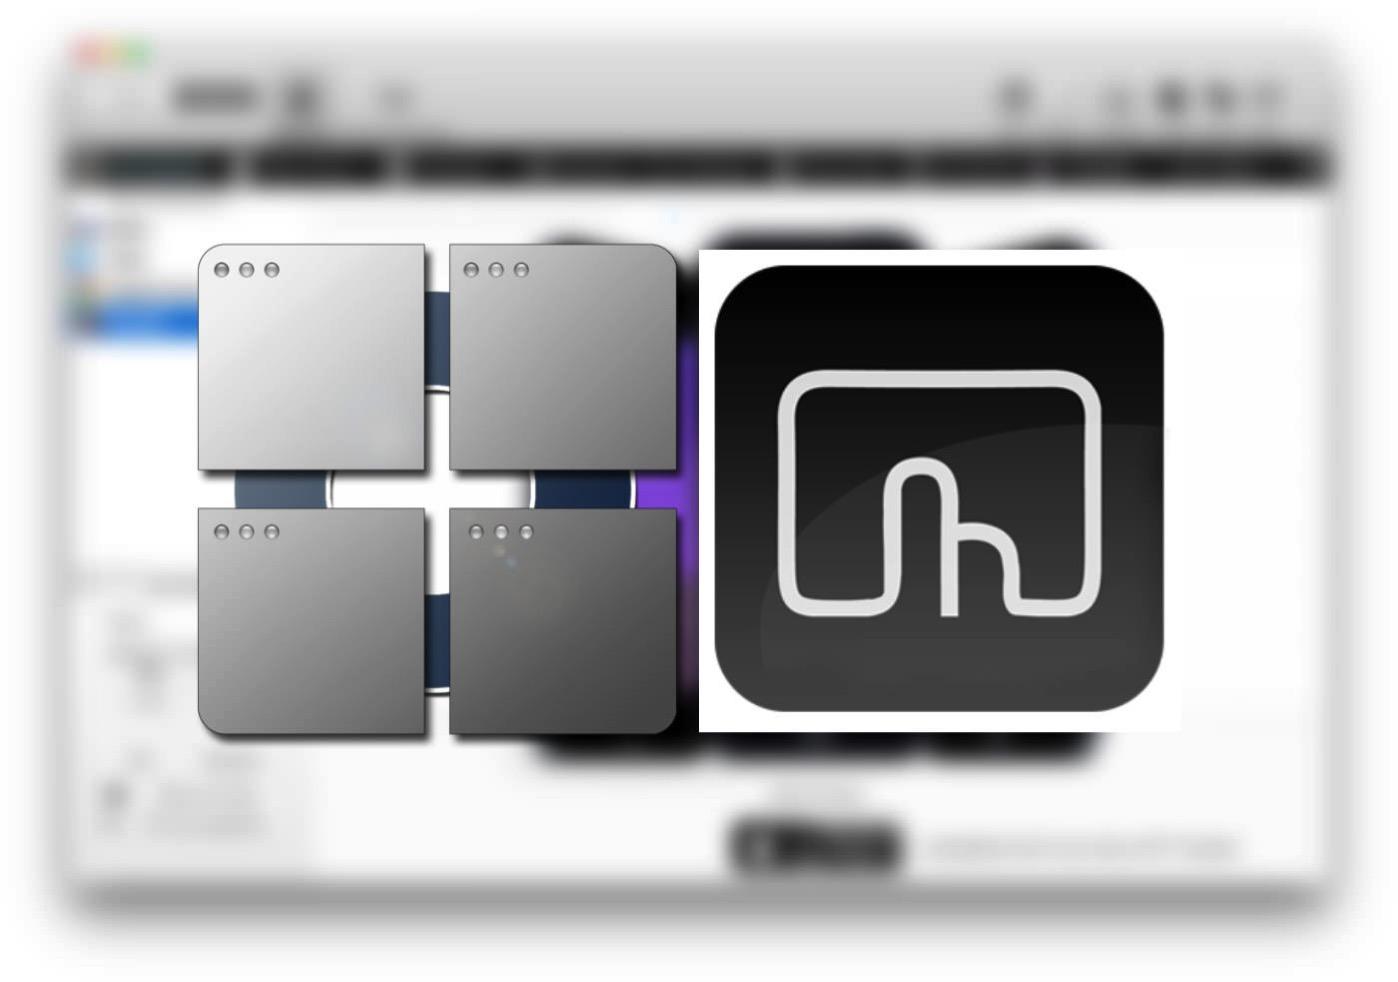 [Mac][BTT-2]トラックパッドジェスチャ多機能アプリ「BetterTouchTool」のライセンス購入をしなくてもこんな方法があったよ